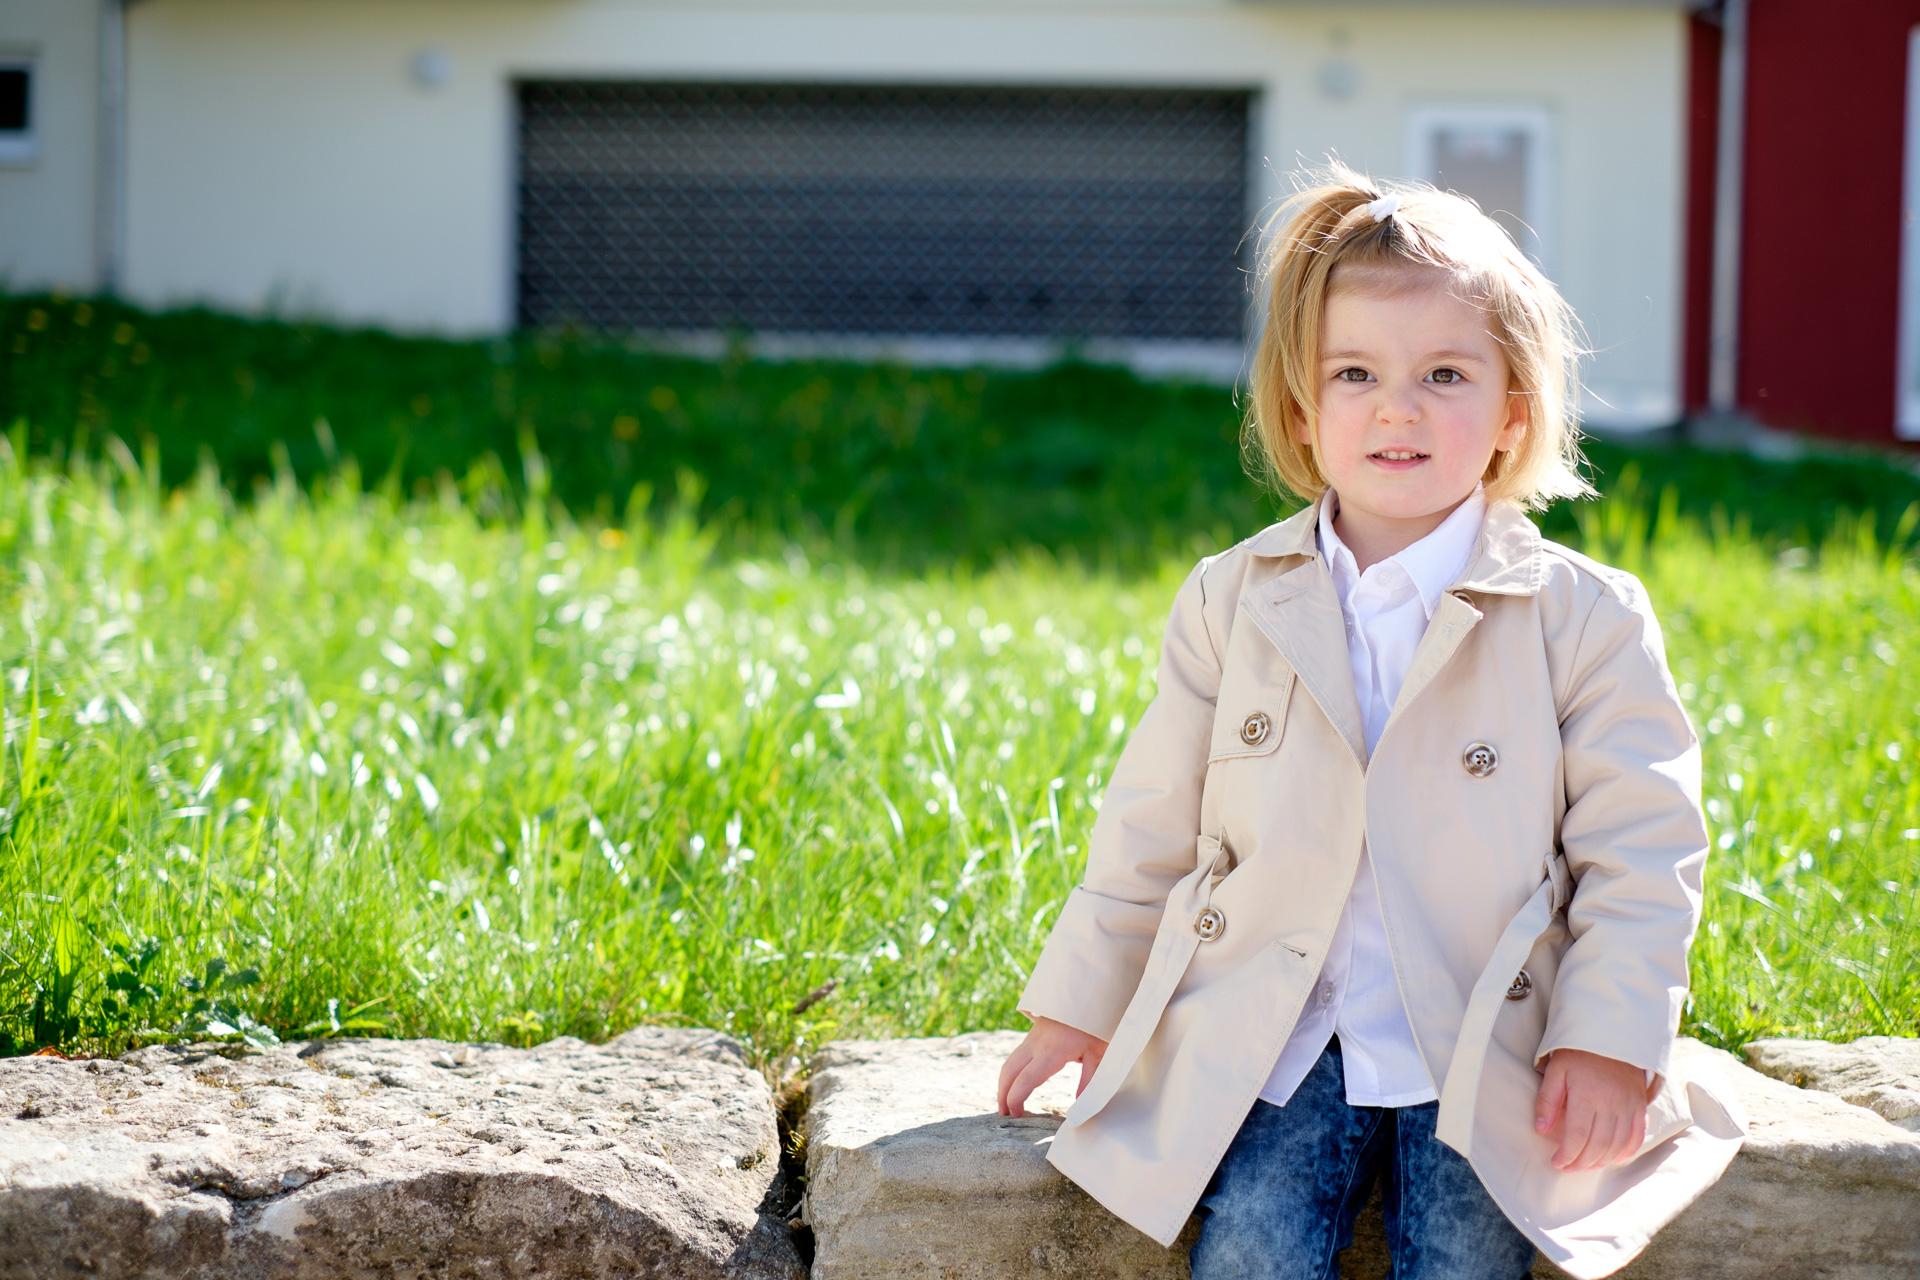 Kinderportrait Kind im Trenchcoat auf Mauer